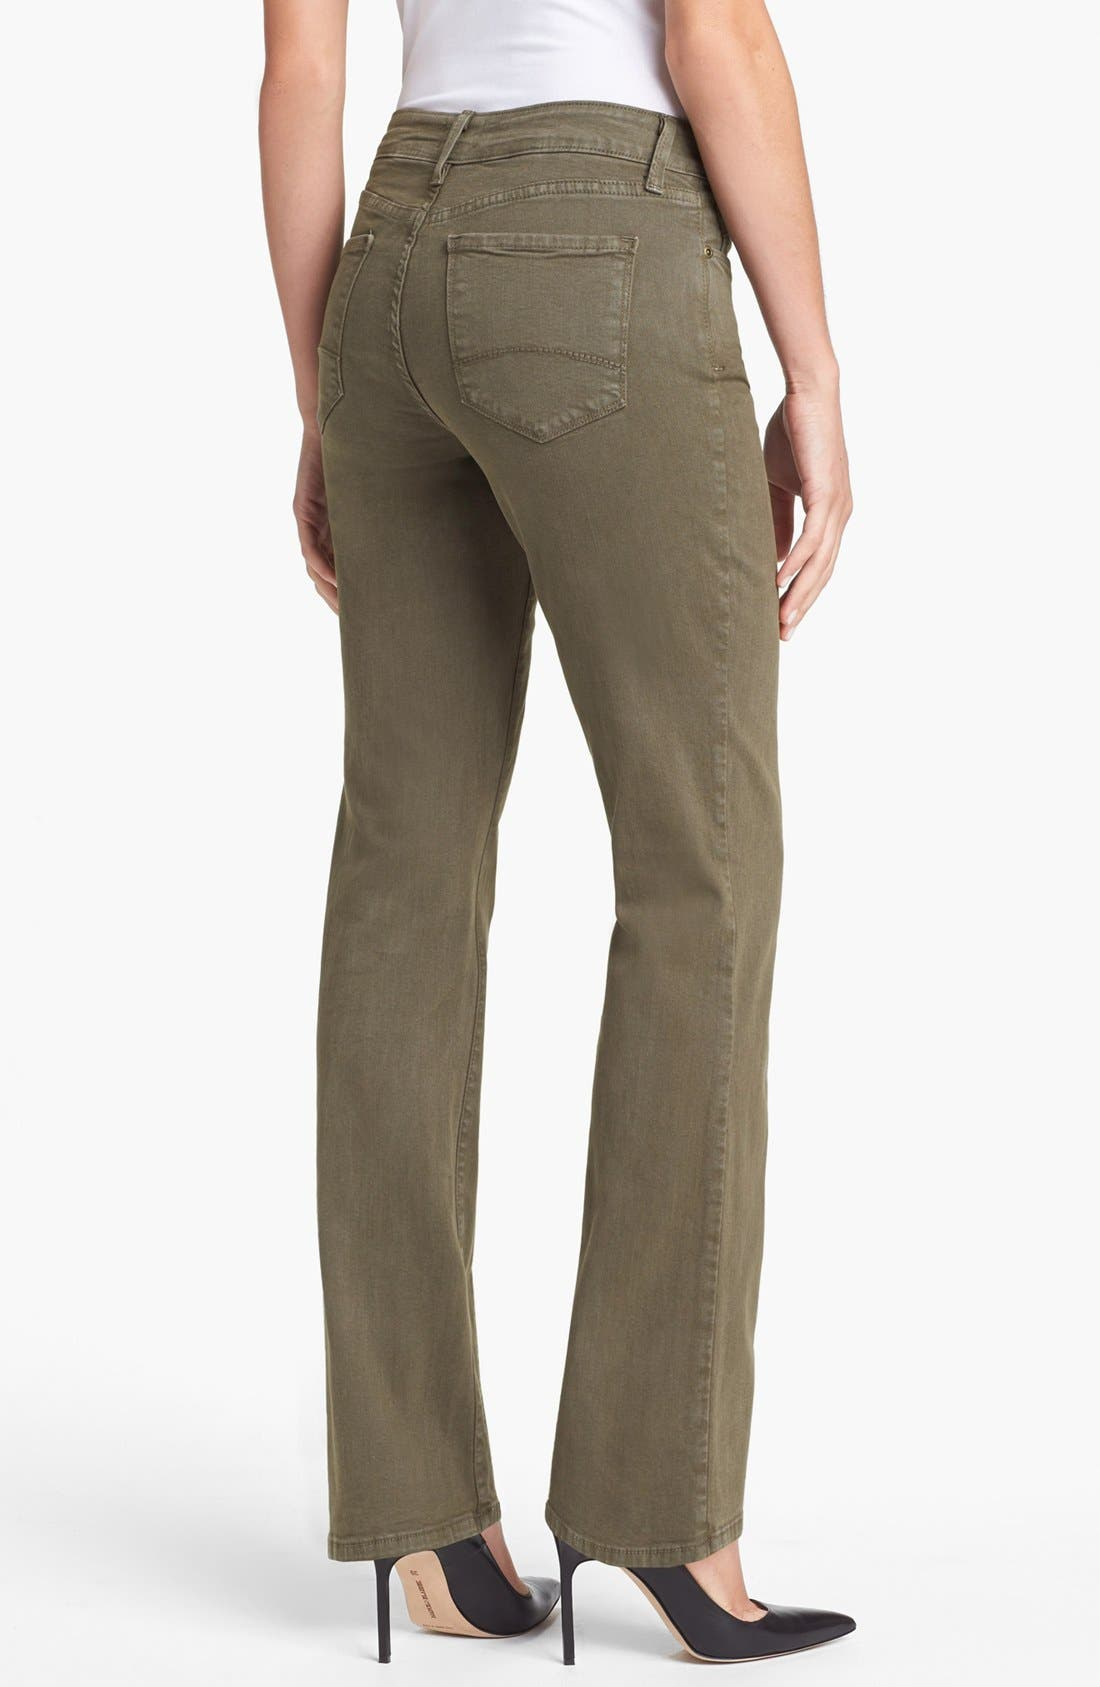 Alternate Image 2  - NYDJ 'Barbara' Colored Stretch Bootcut Jeans